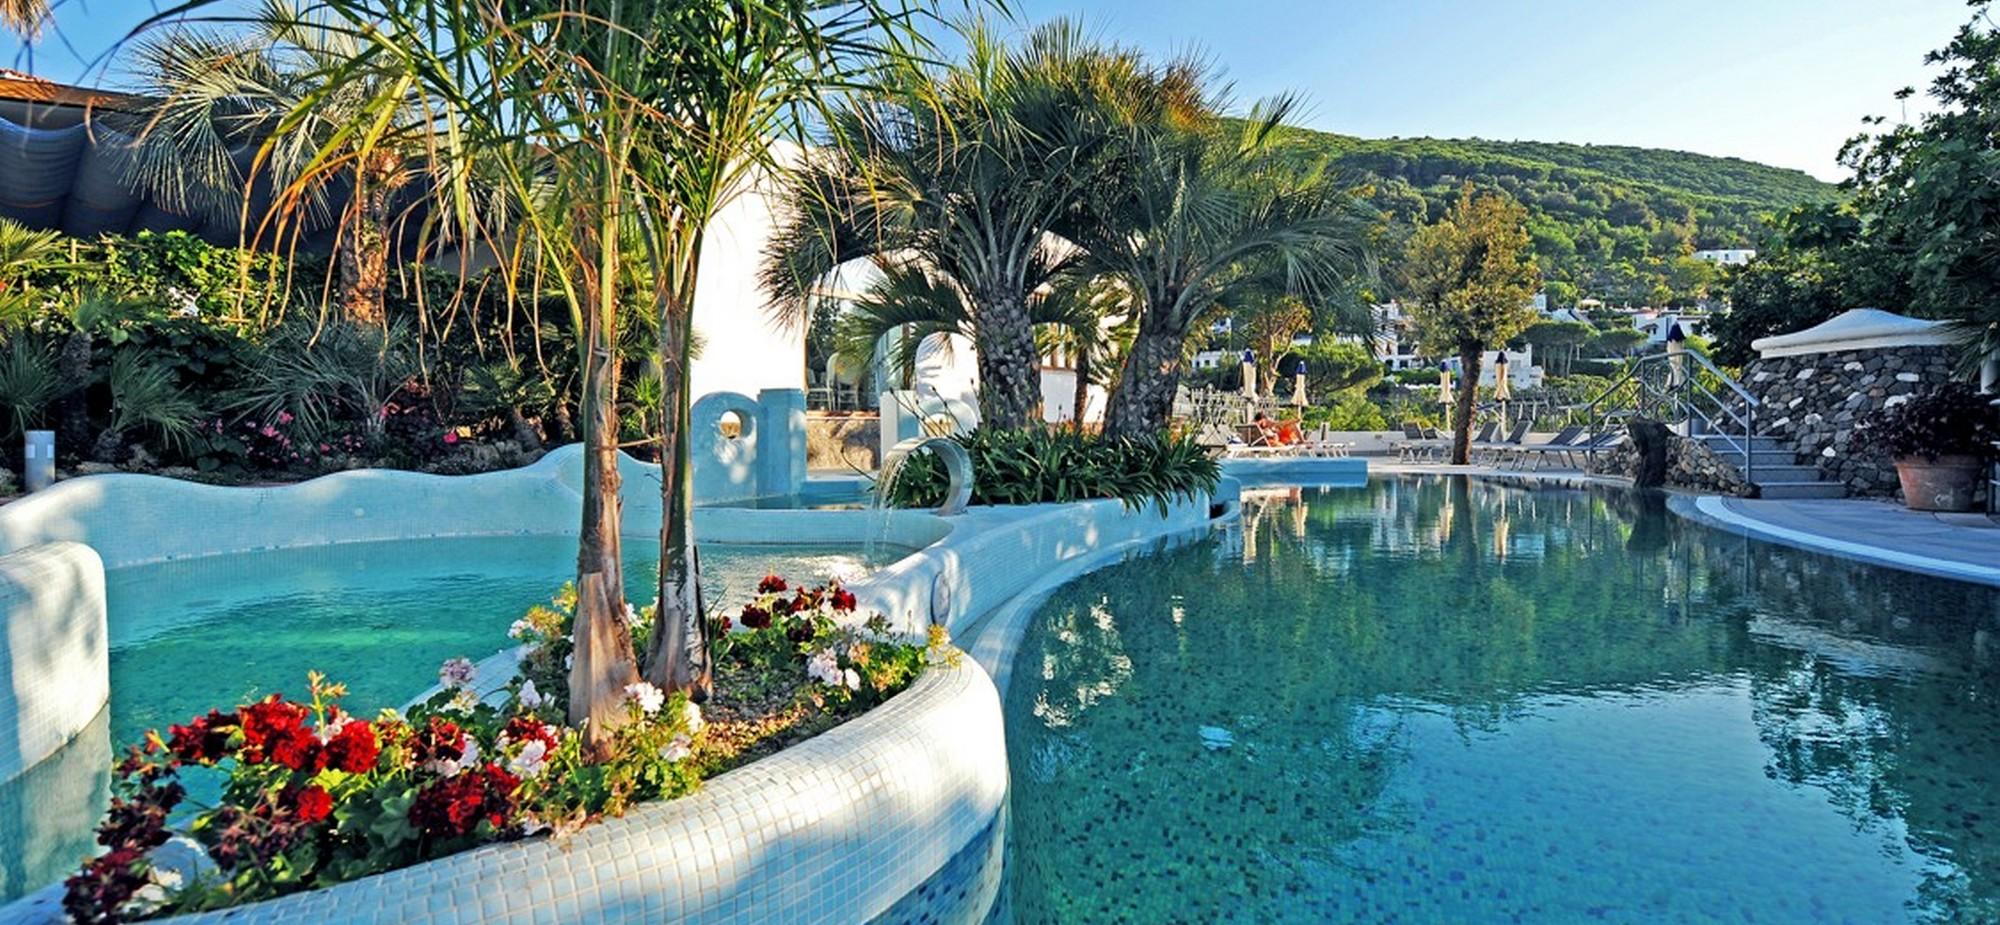 Hotel Terme Poseidon Ischia